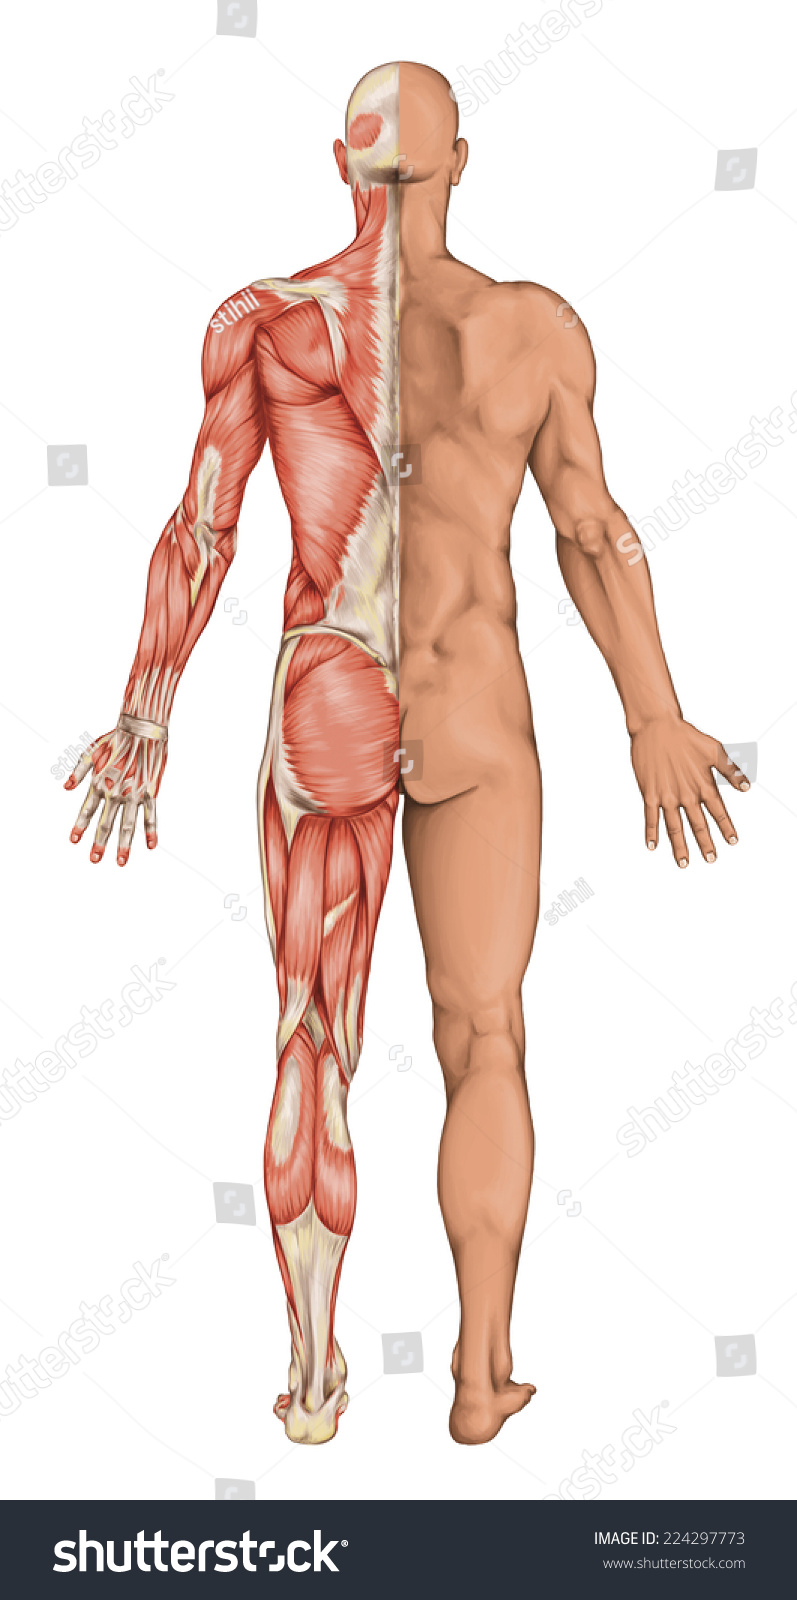 Royalty-free Male anatomy, man\'s anatomical body,… #224297773 Stock ...